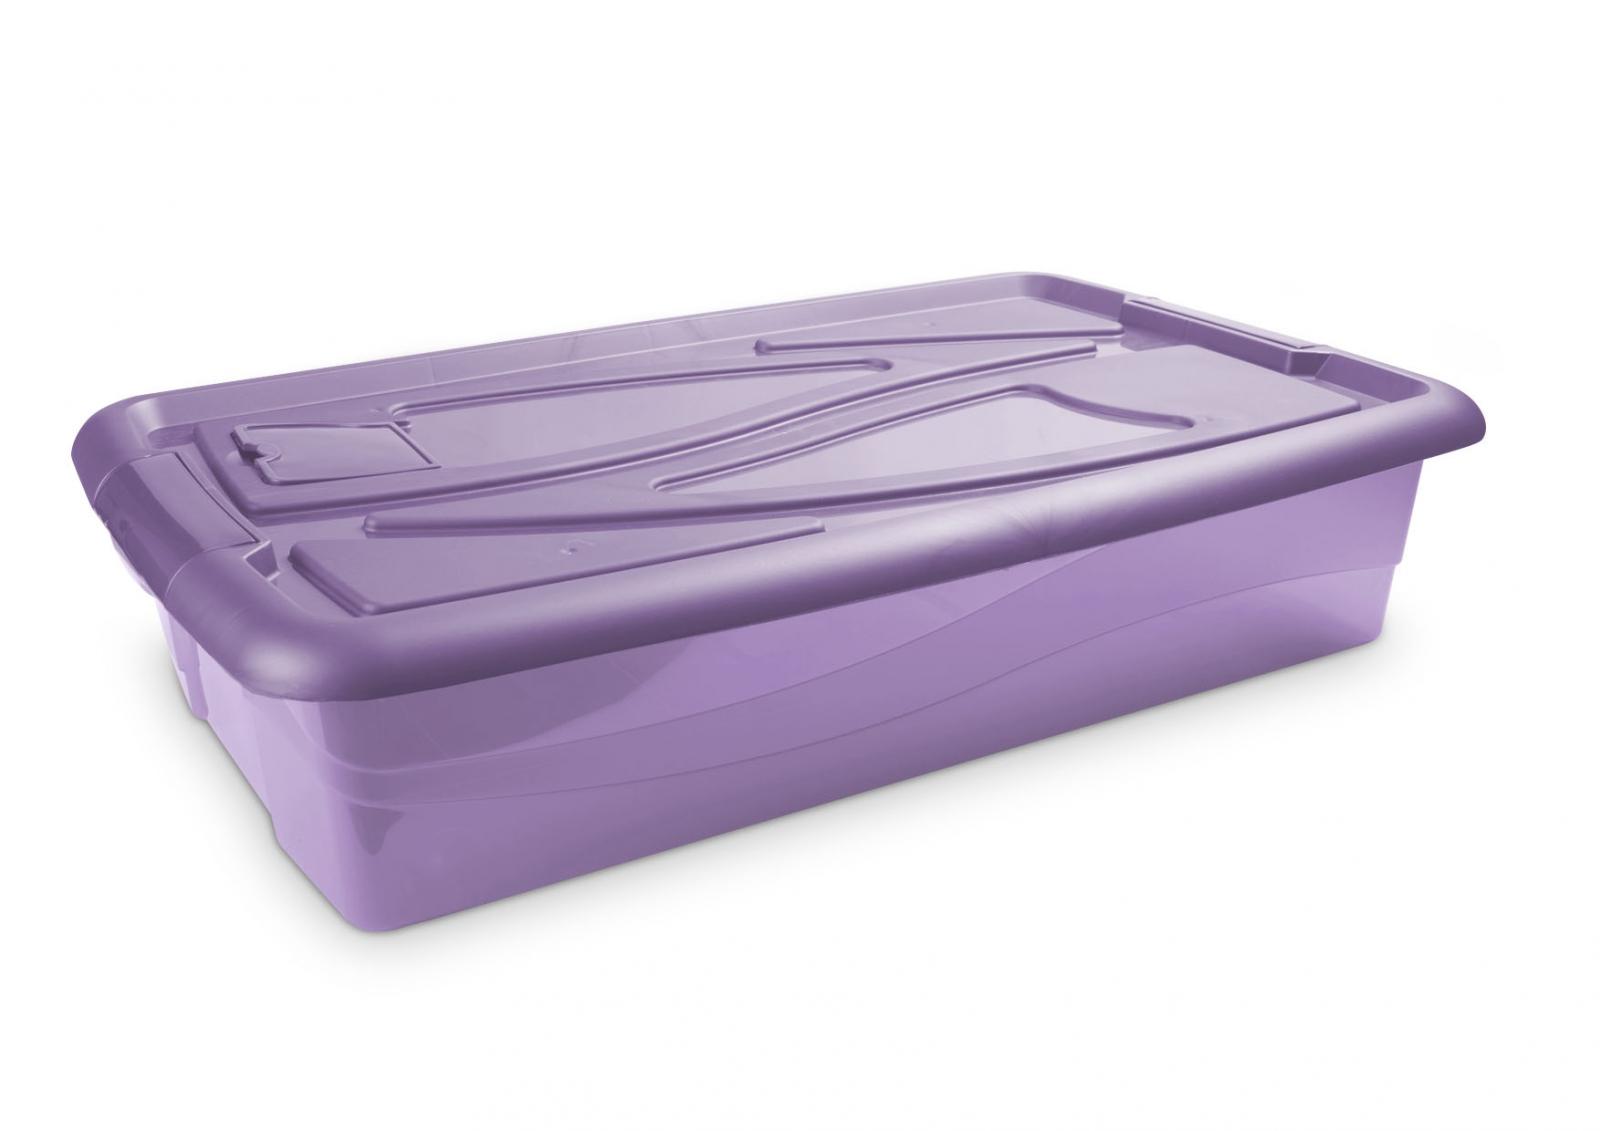 Baúl bajocama antipolillas violeta